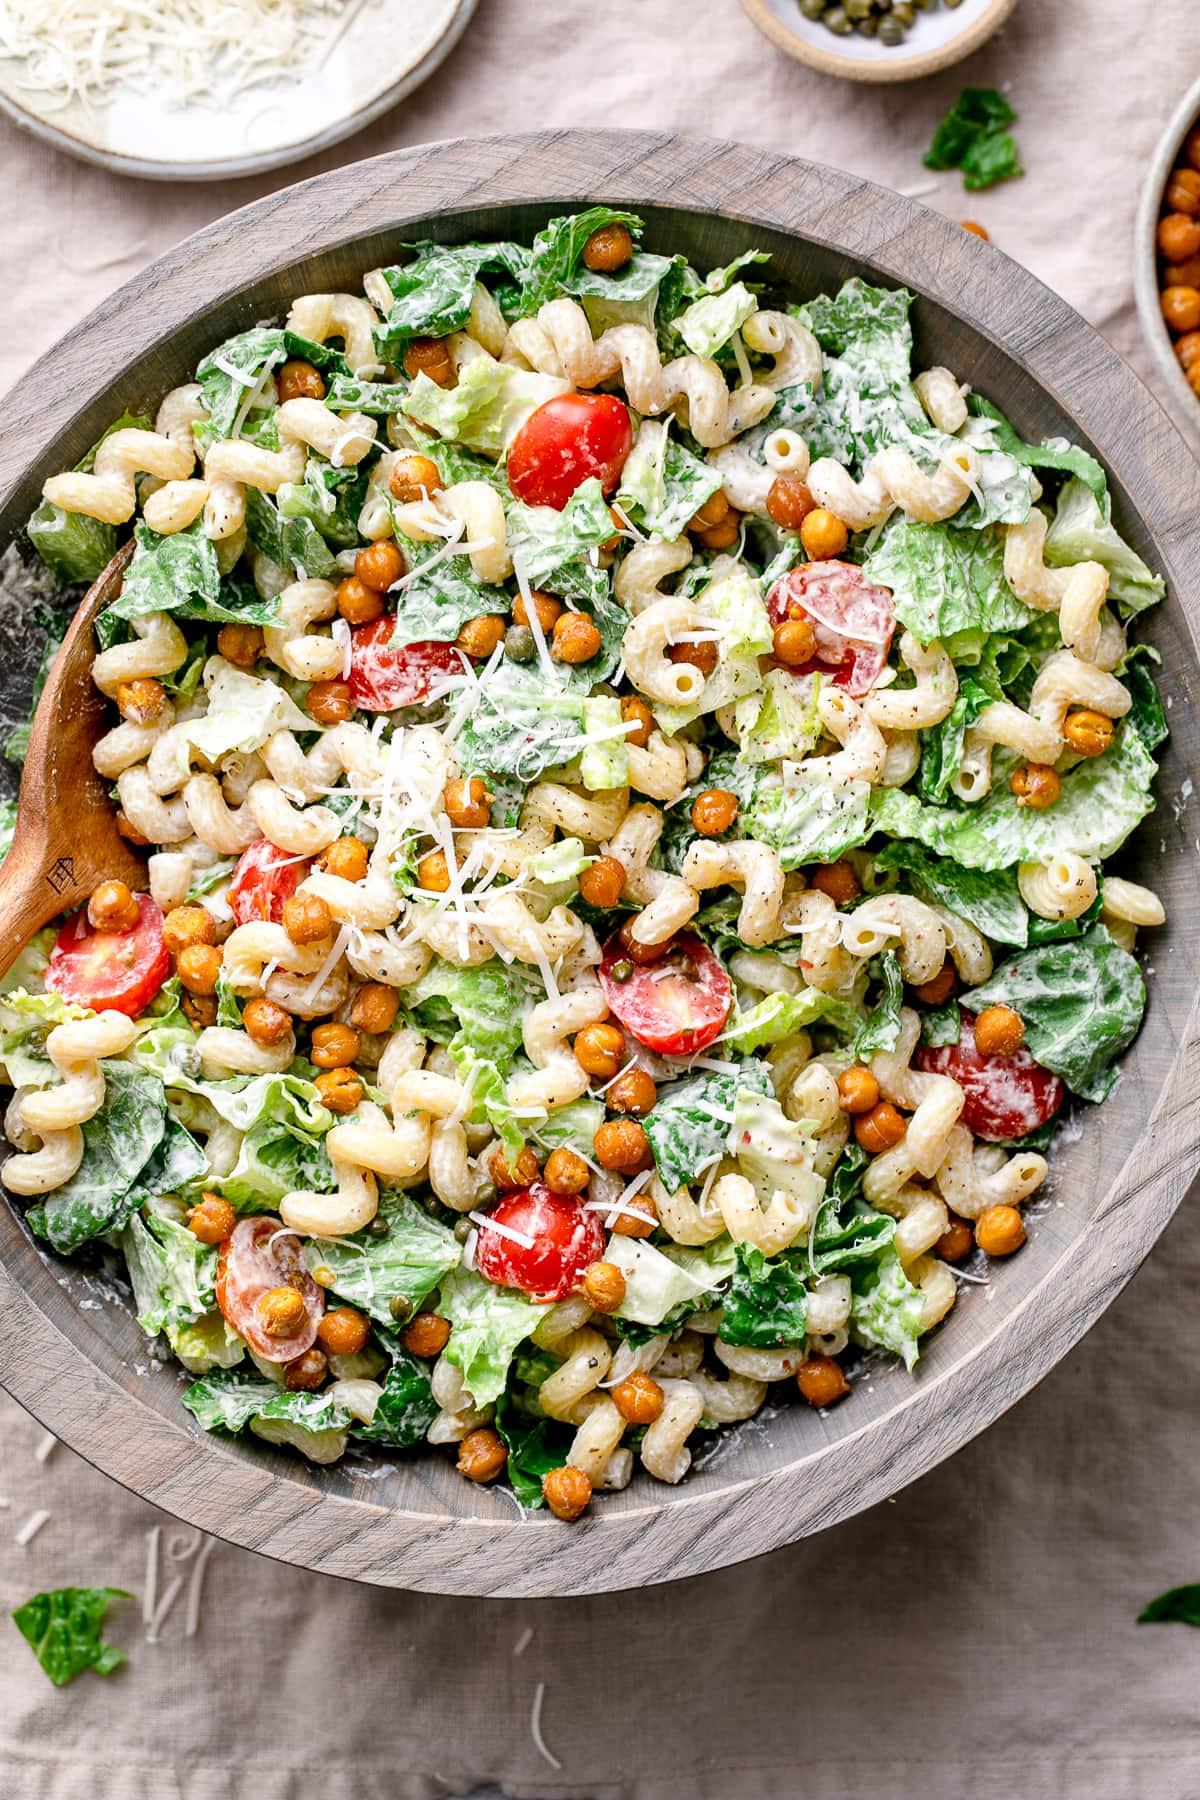 top down view of serving bowl with healthy vegan caesar pasta salad.